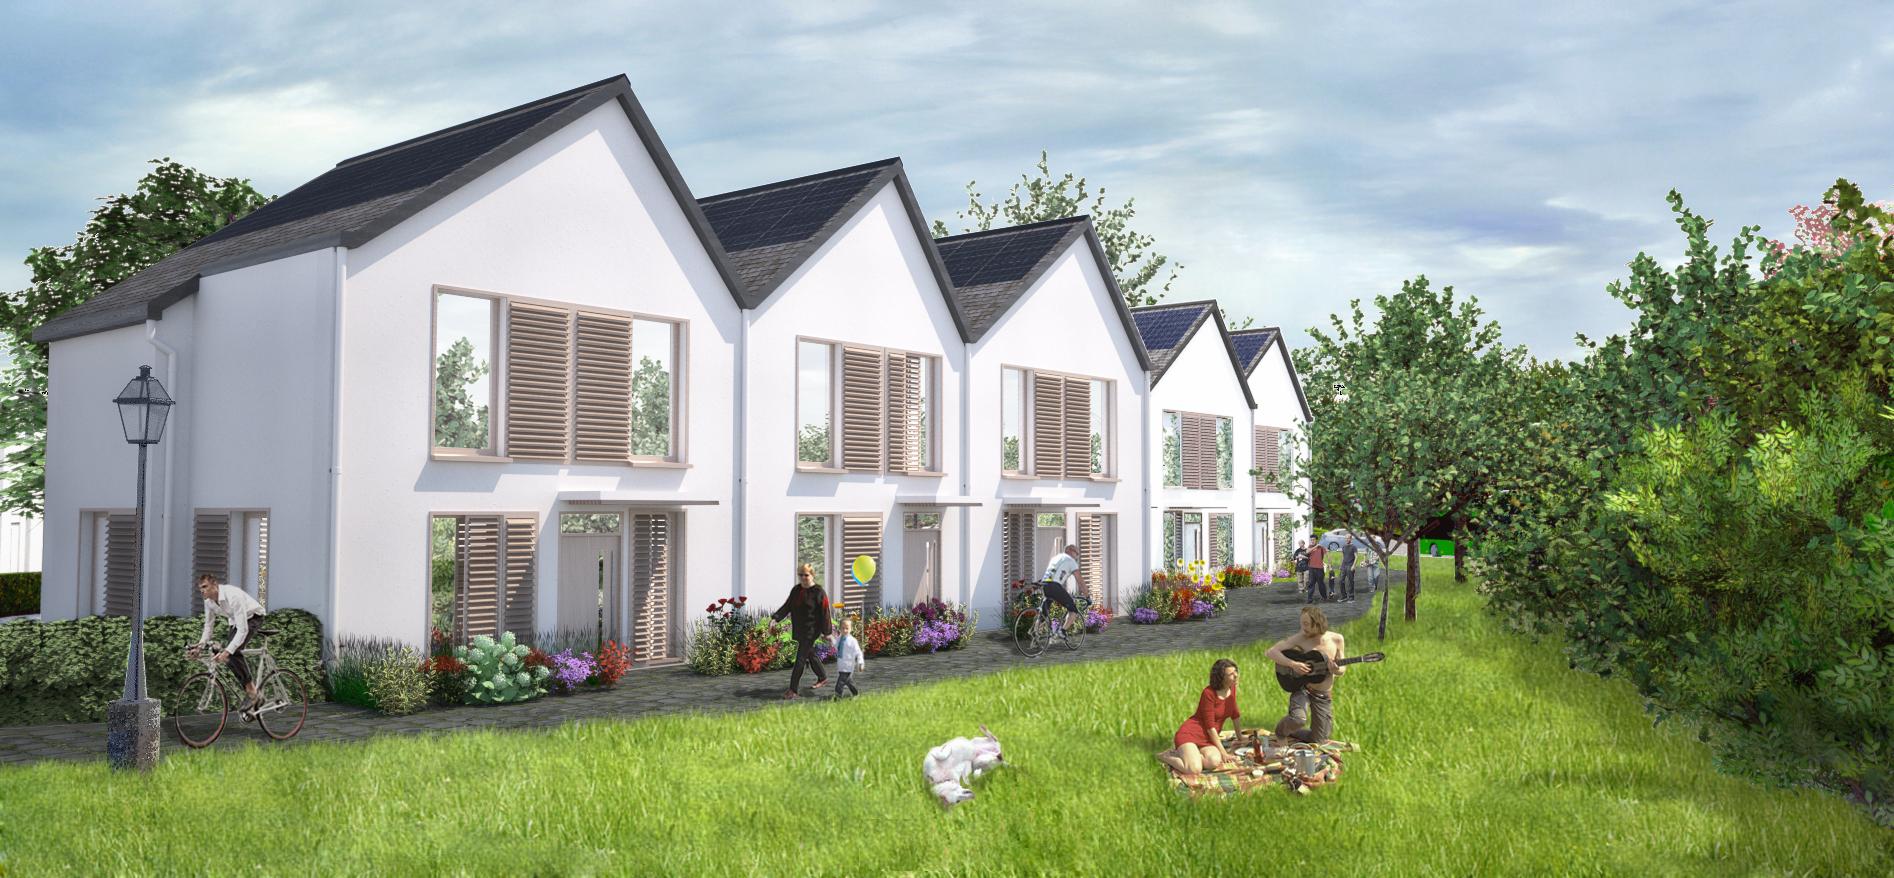 Bicester - 391-393 - Terrace Housing.jpg